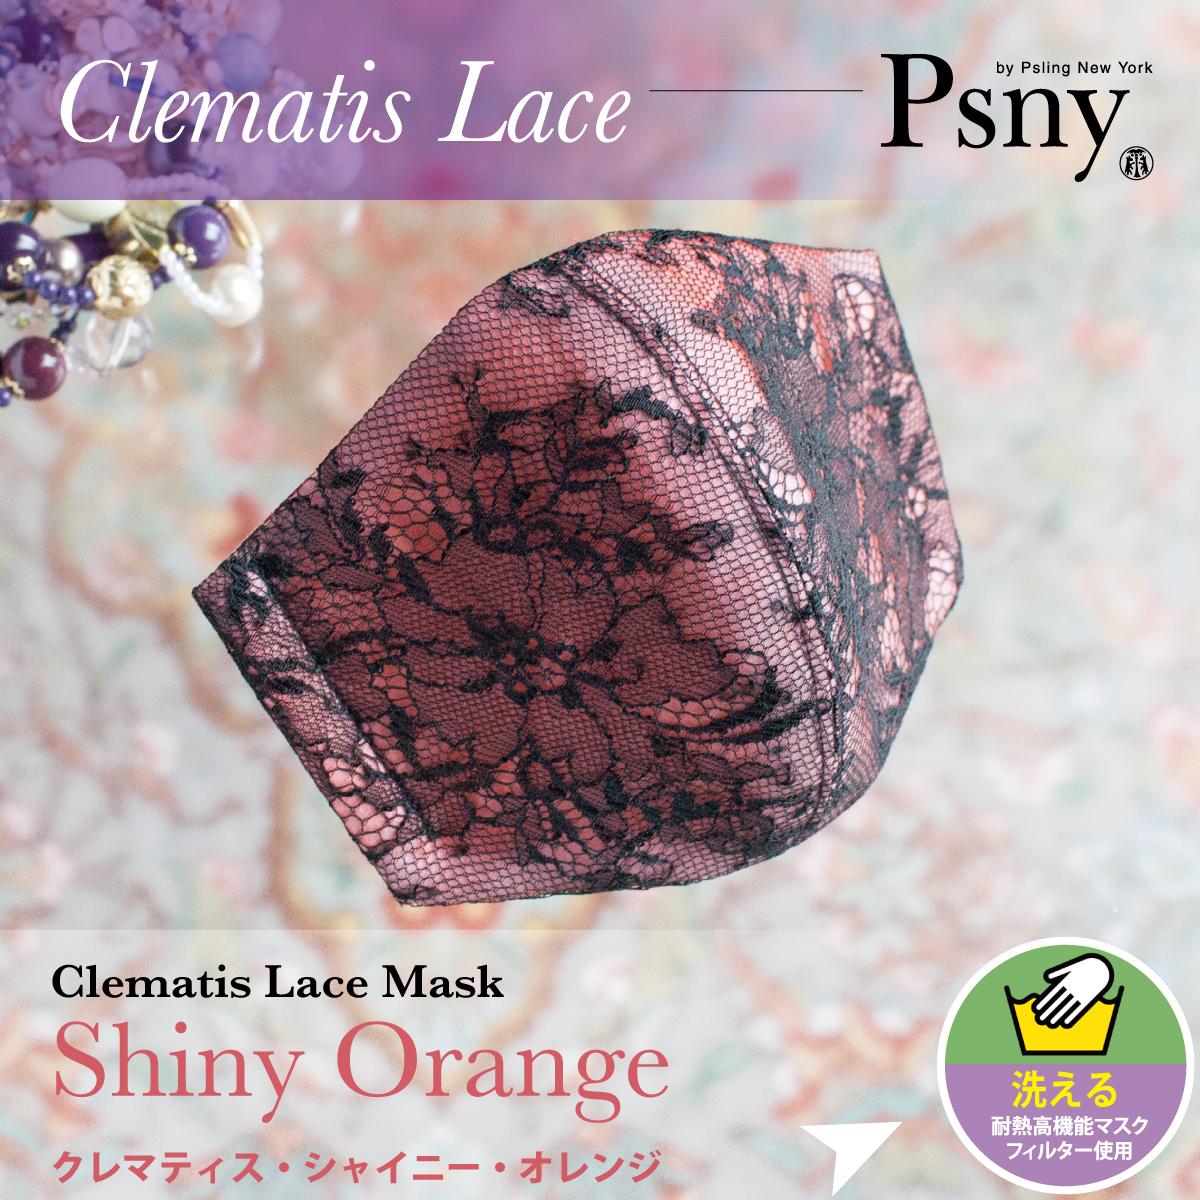 PSNY クレマティス レース オレンジ 花粉 黄砂 洗える不織布フィルター入り 立体 大人用 マスク 送料無料 L09